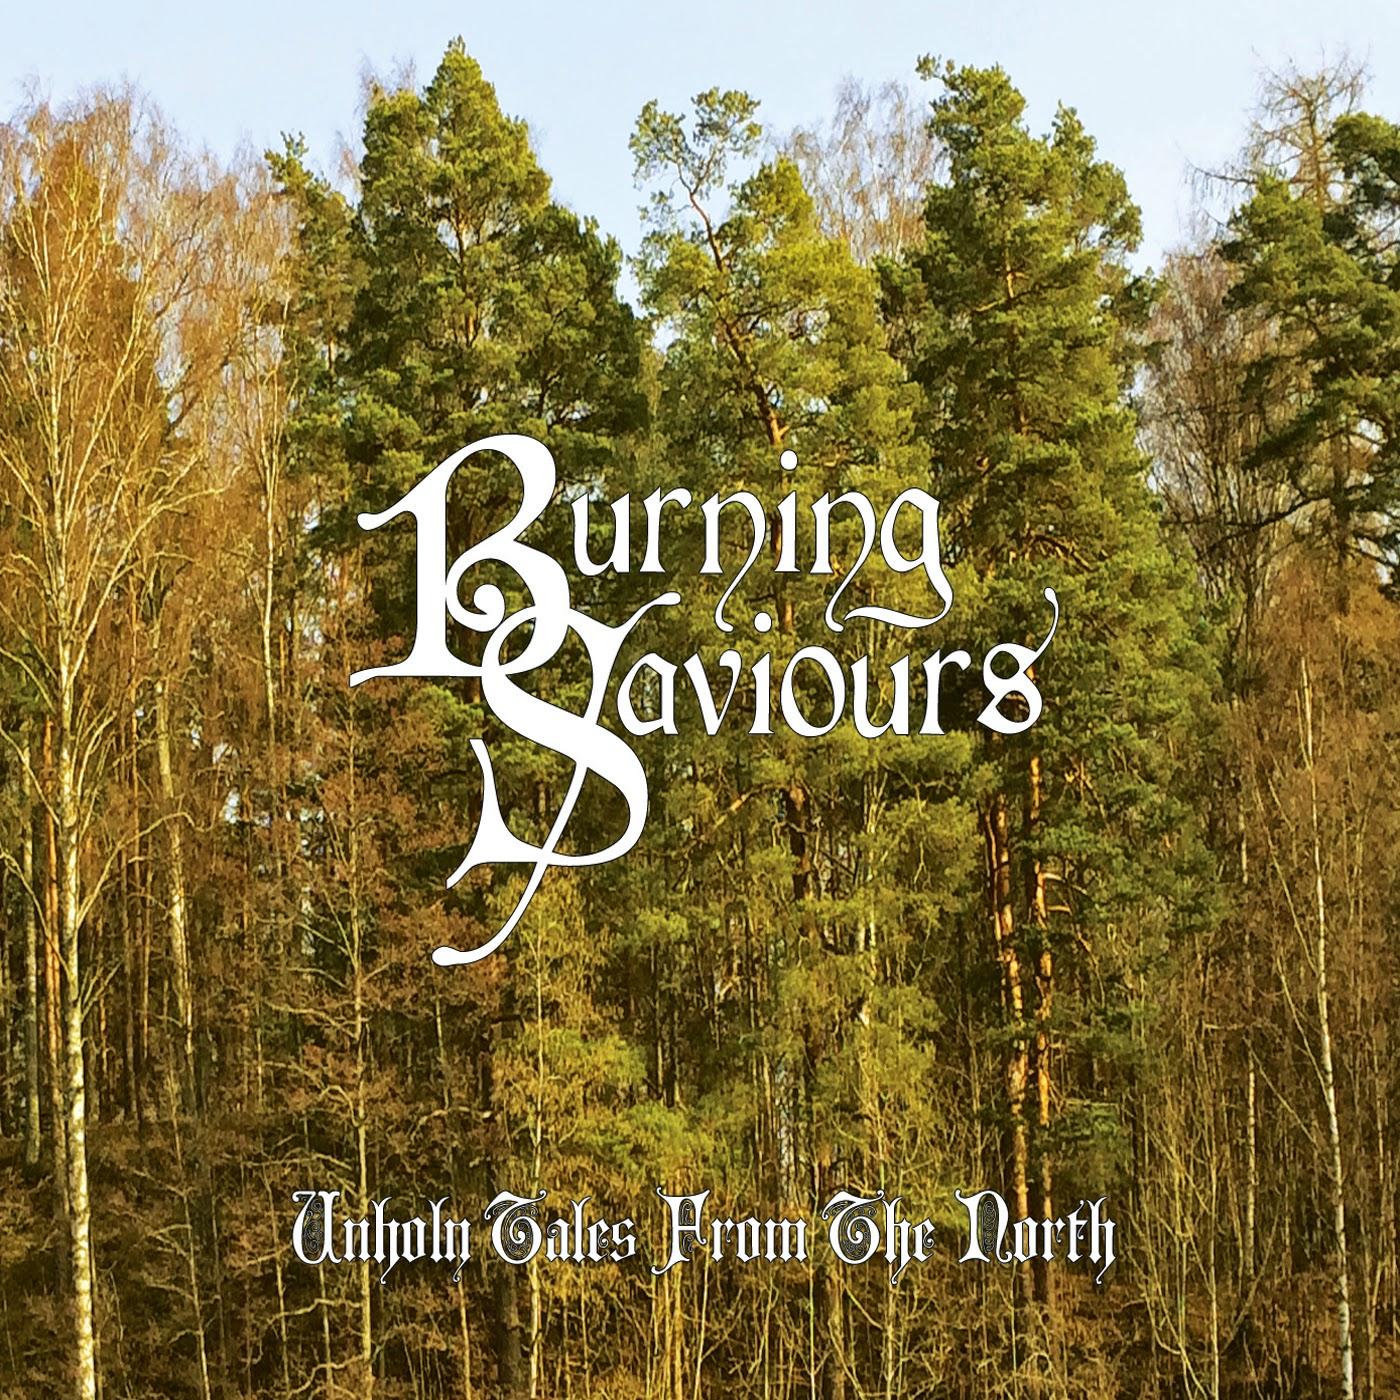 Die neuen Metal-Alben im Januar 2015 - Burning Saviours UNHOLY TALES FROM THE NORTH